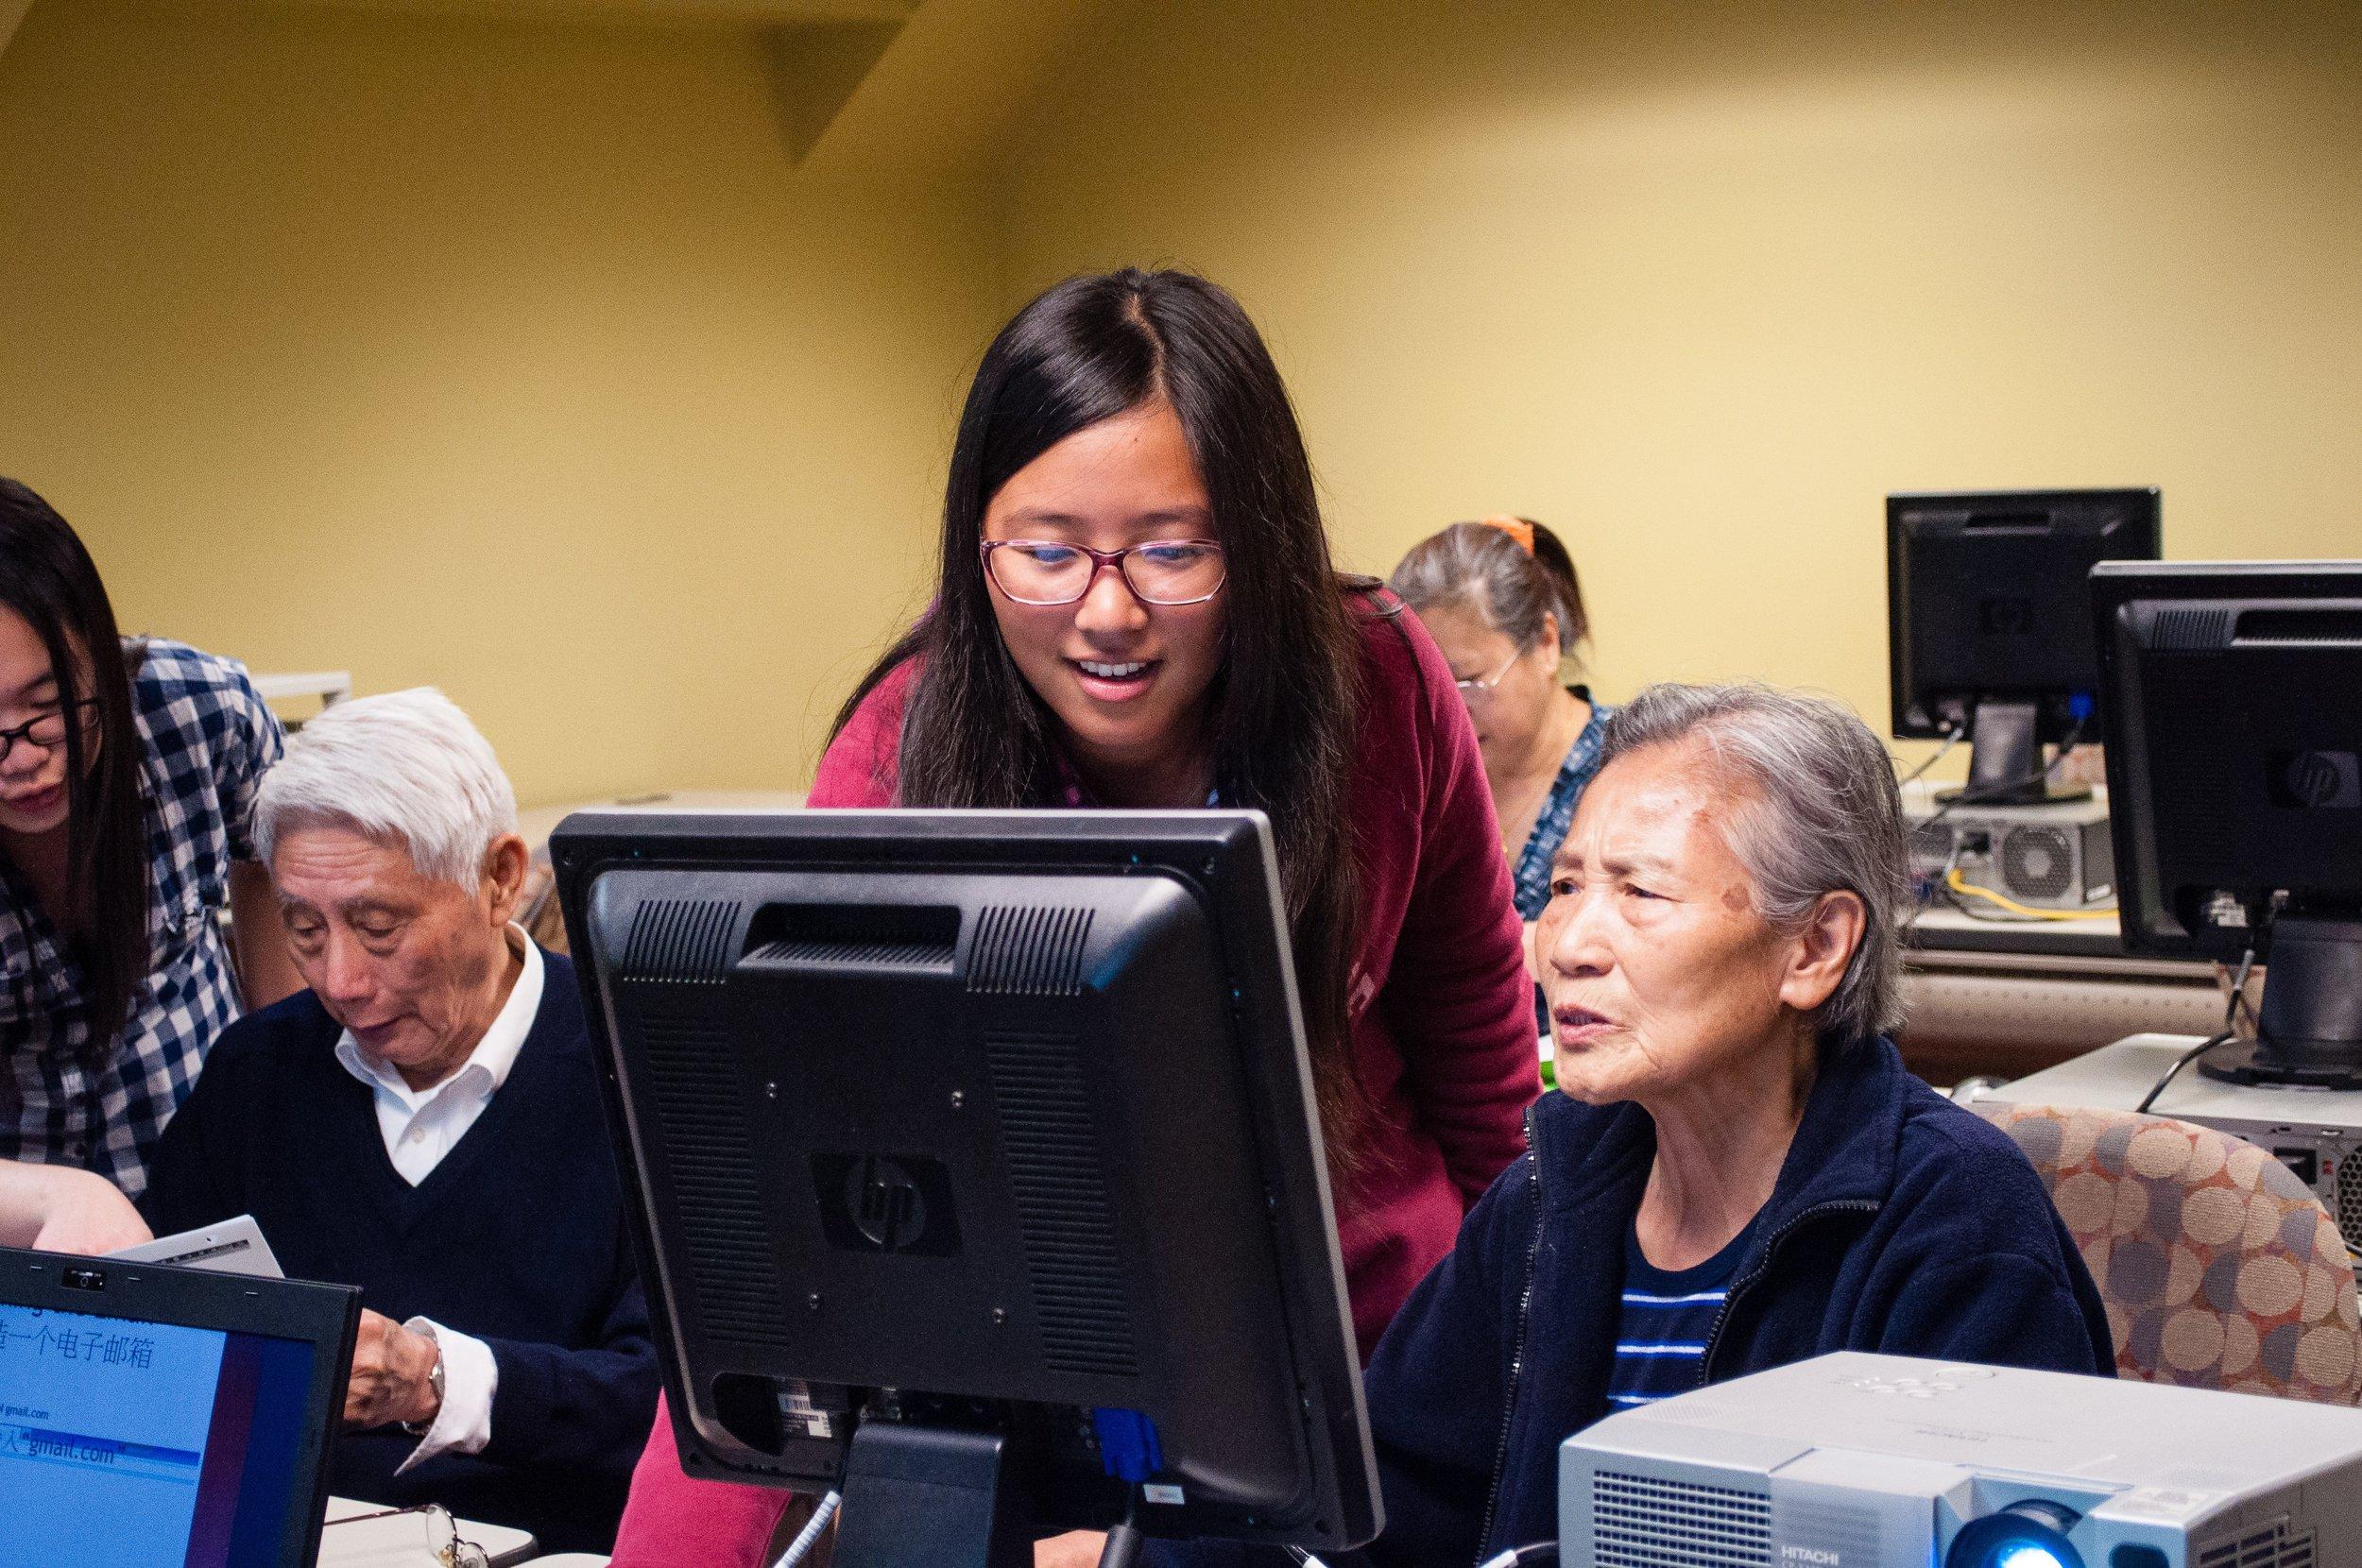 Iris teaching basic computer skills to elders in 2013.